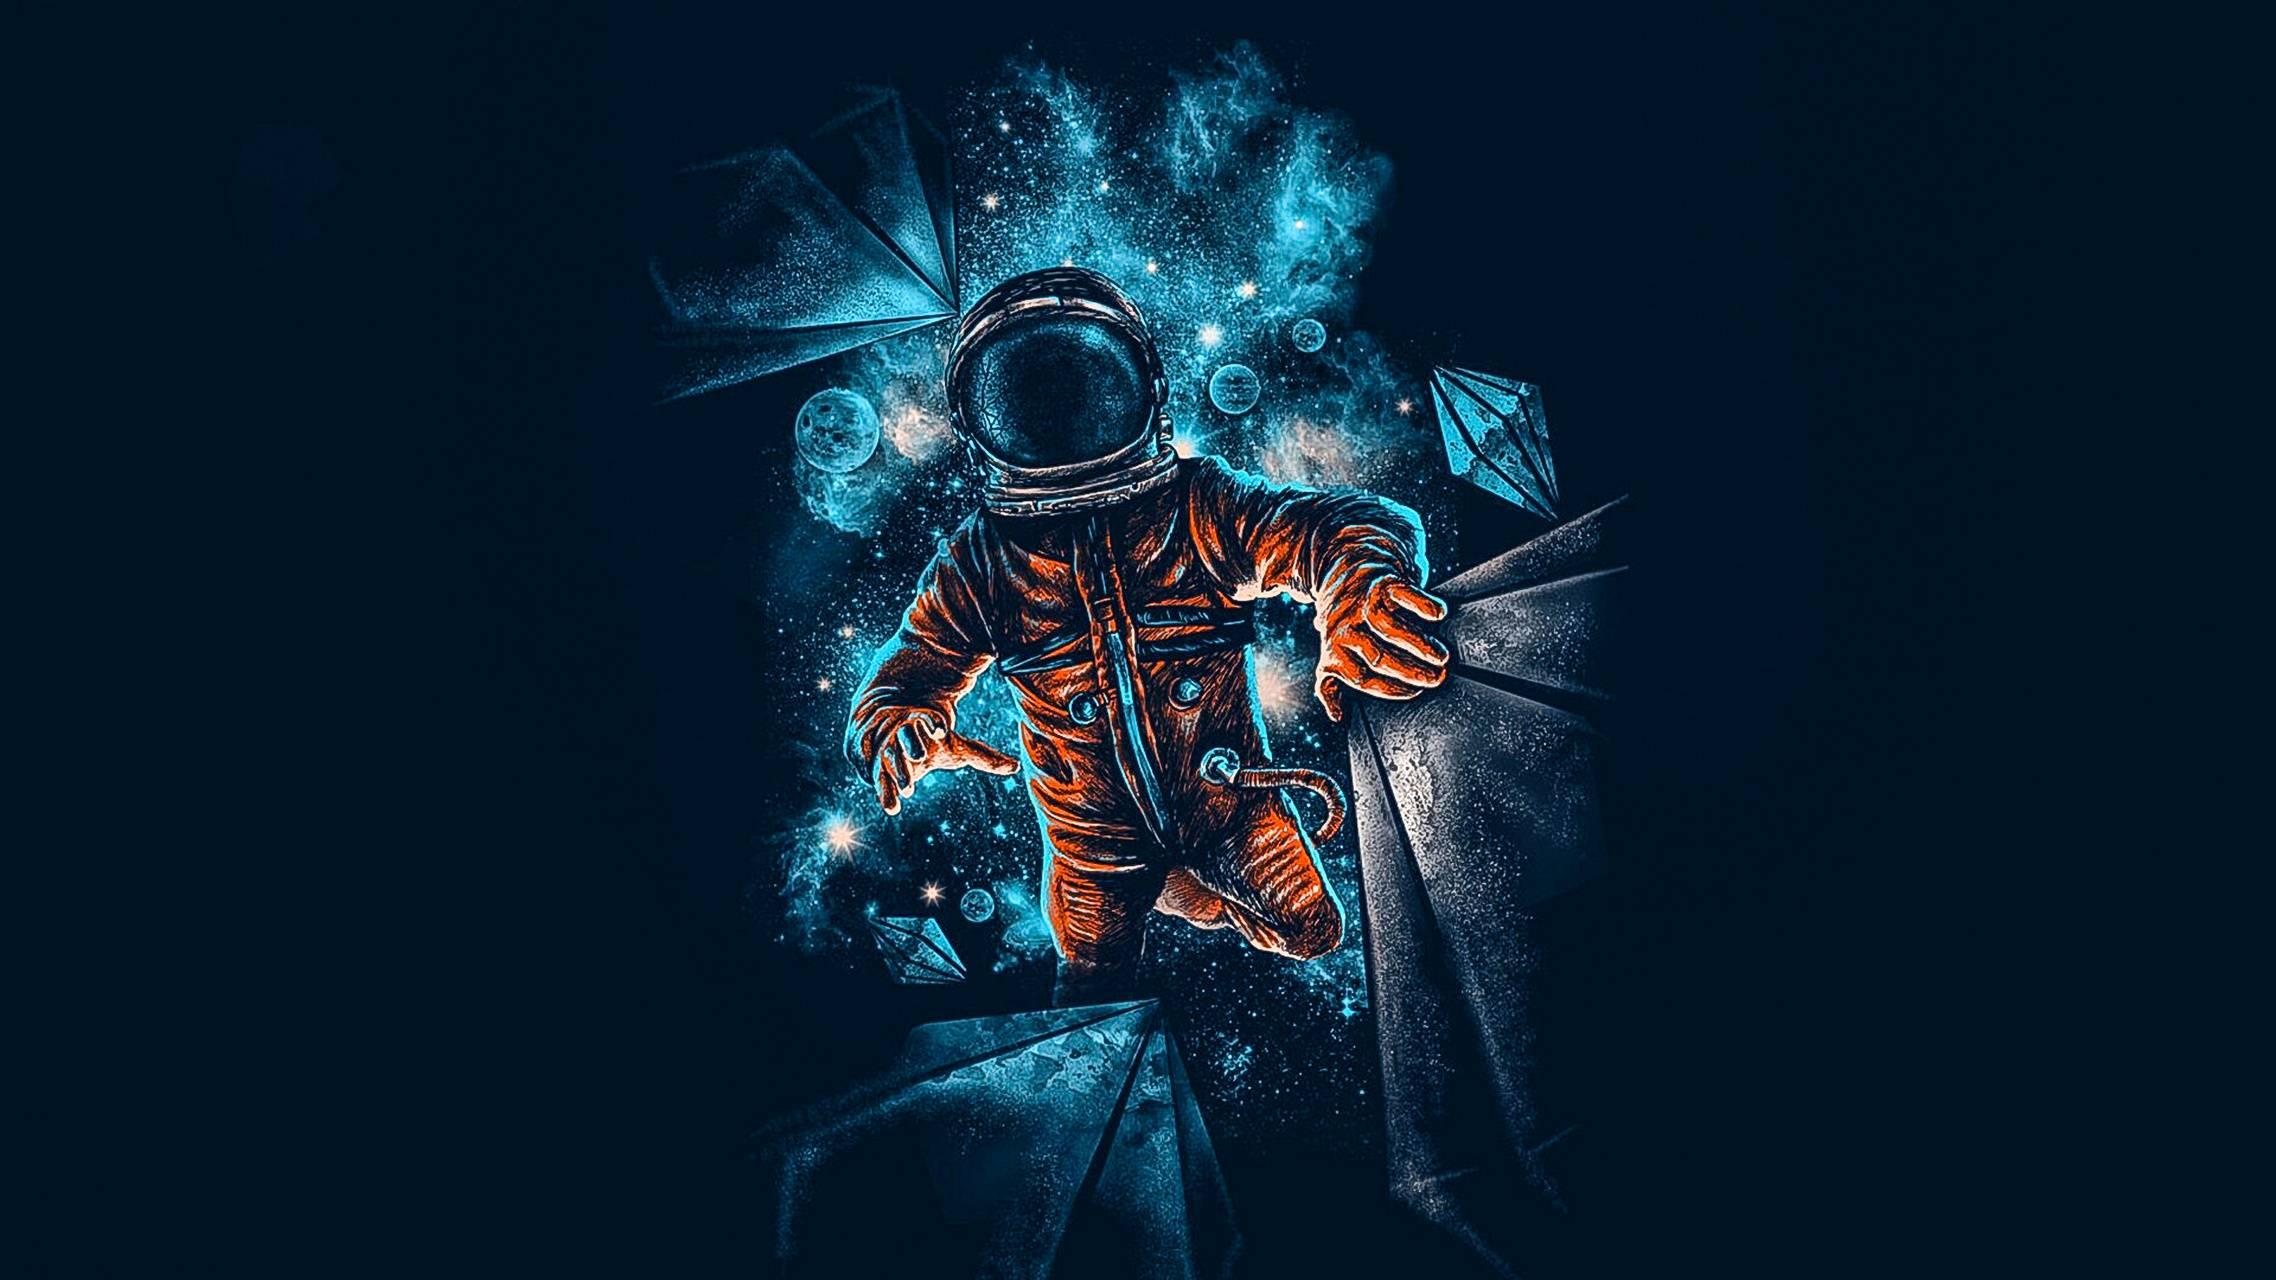 ARTISTIC SPACE MAN